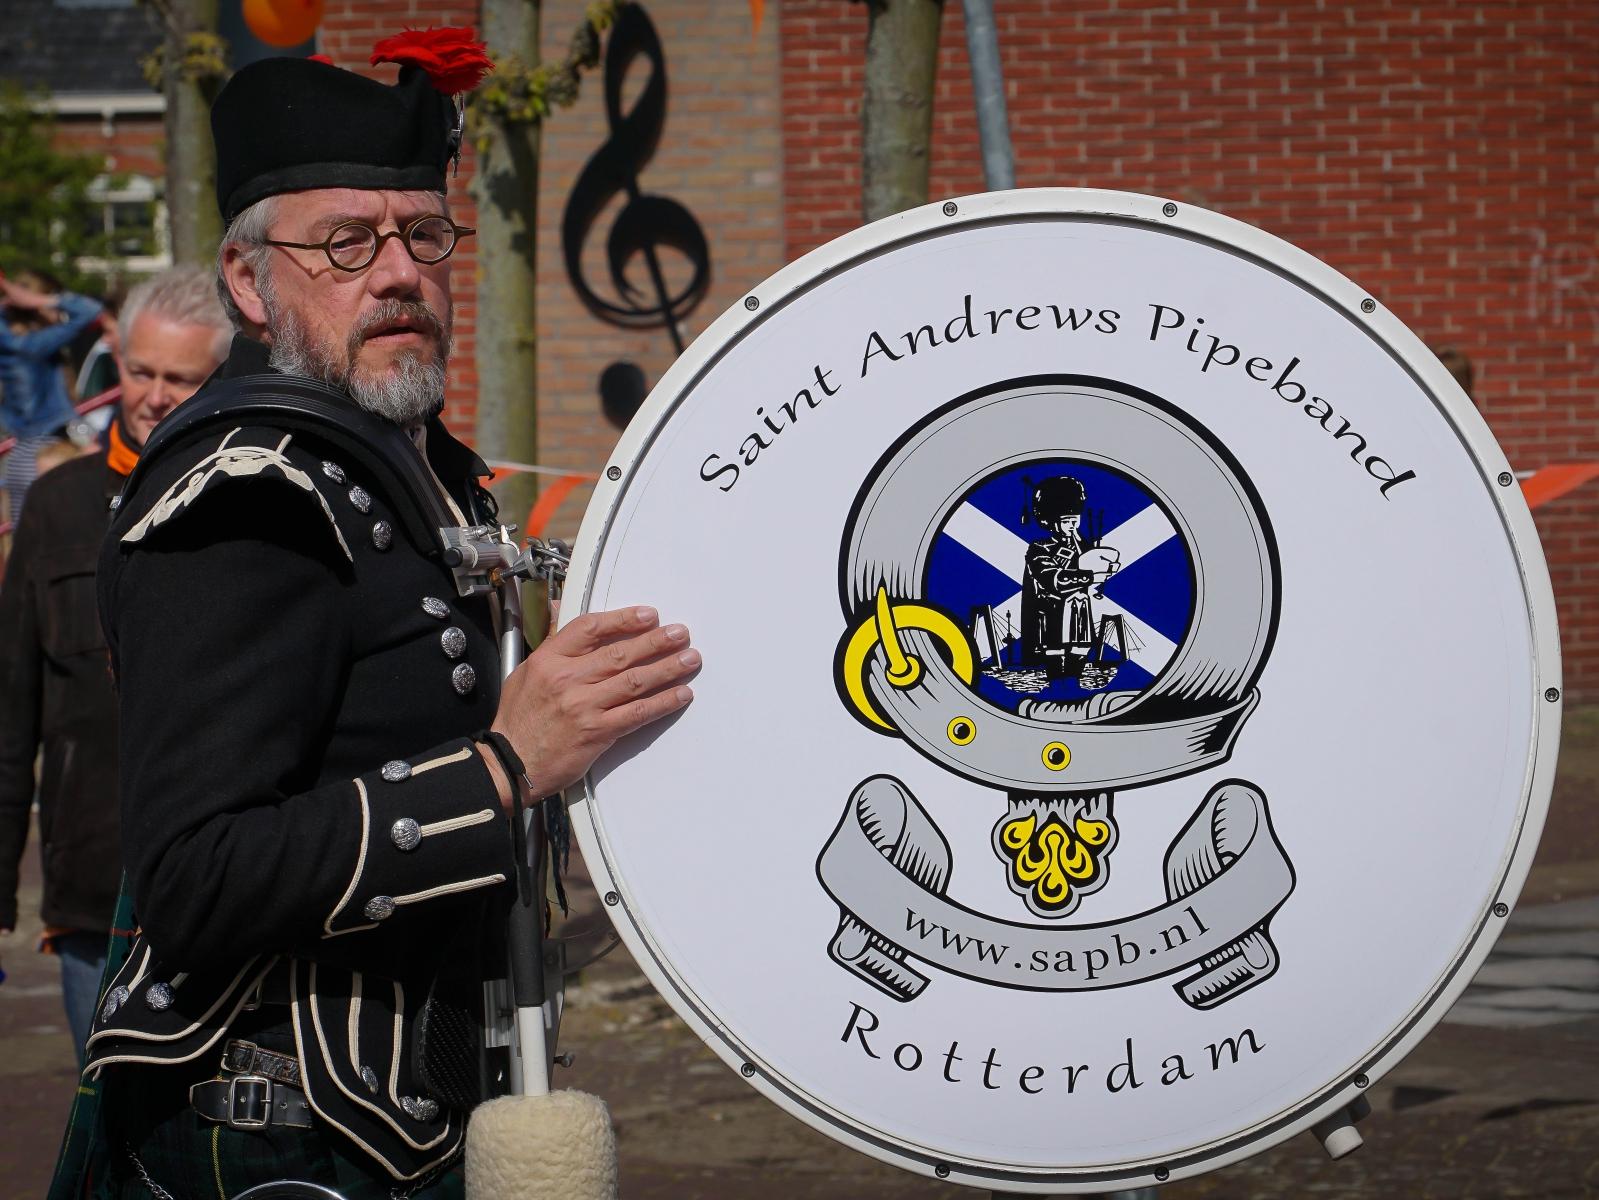 Saint Andrews pipe band